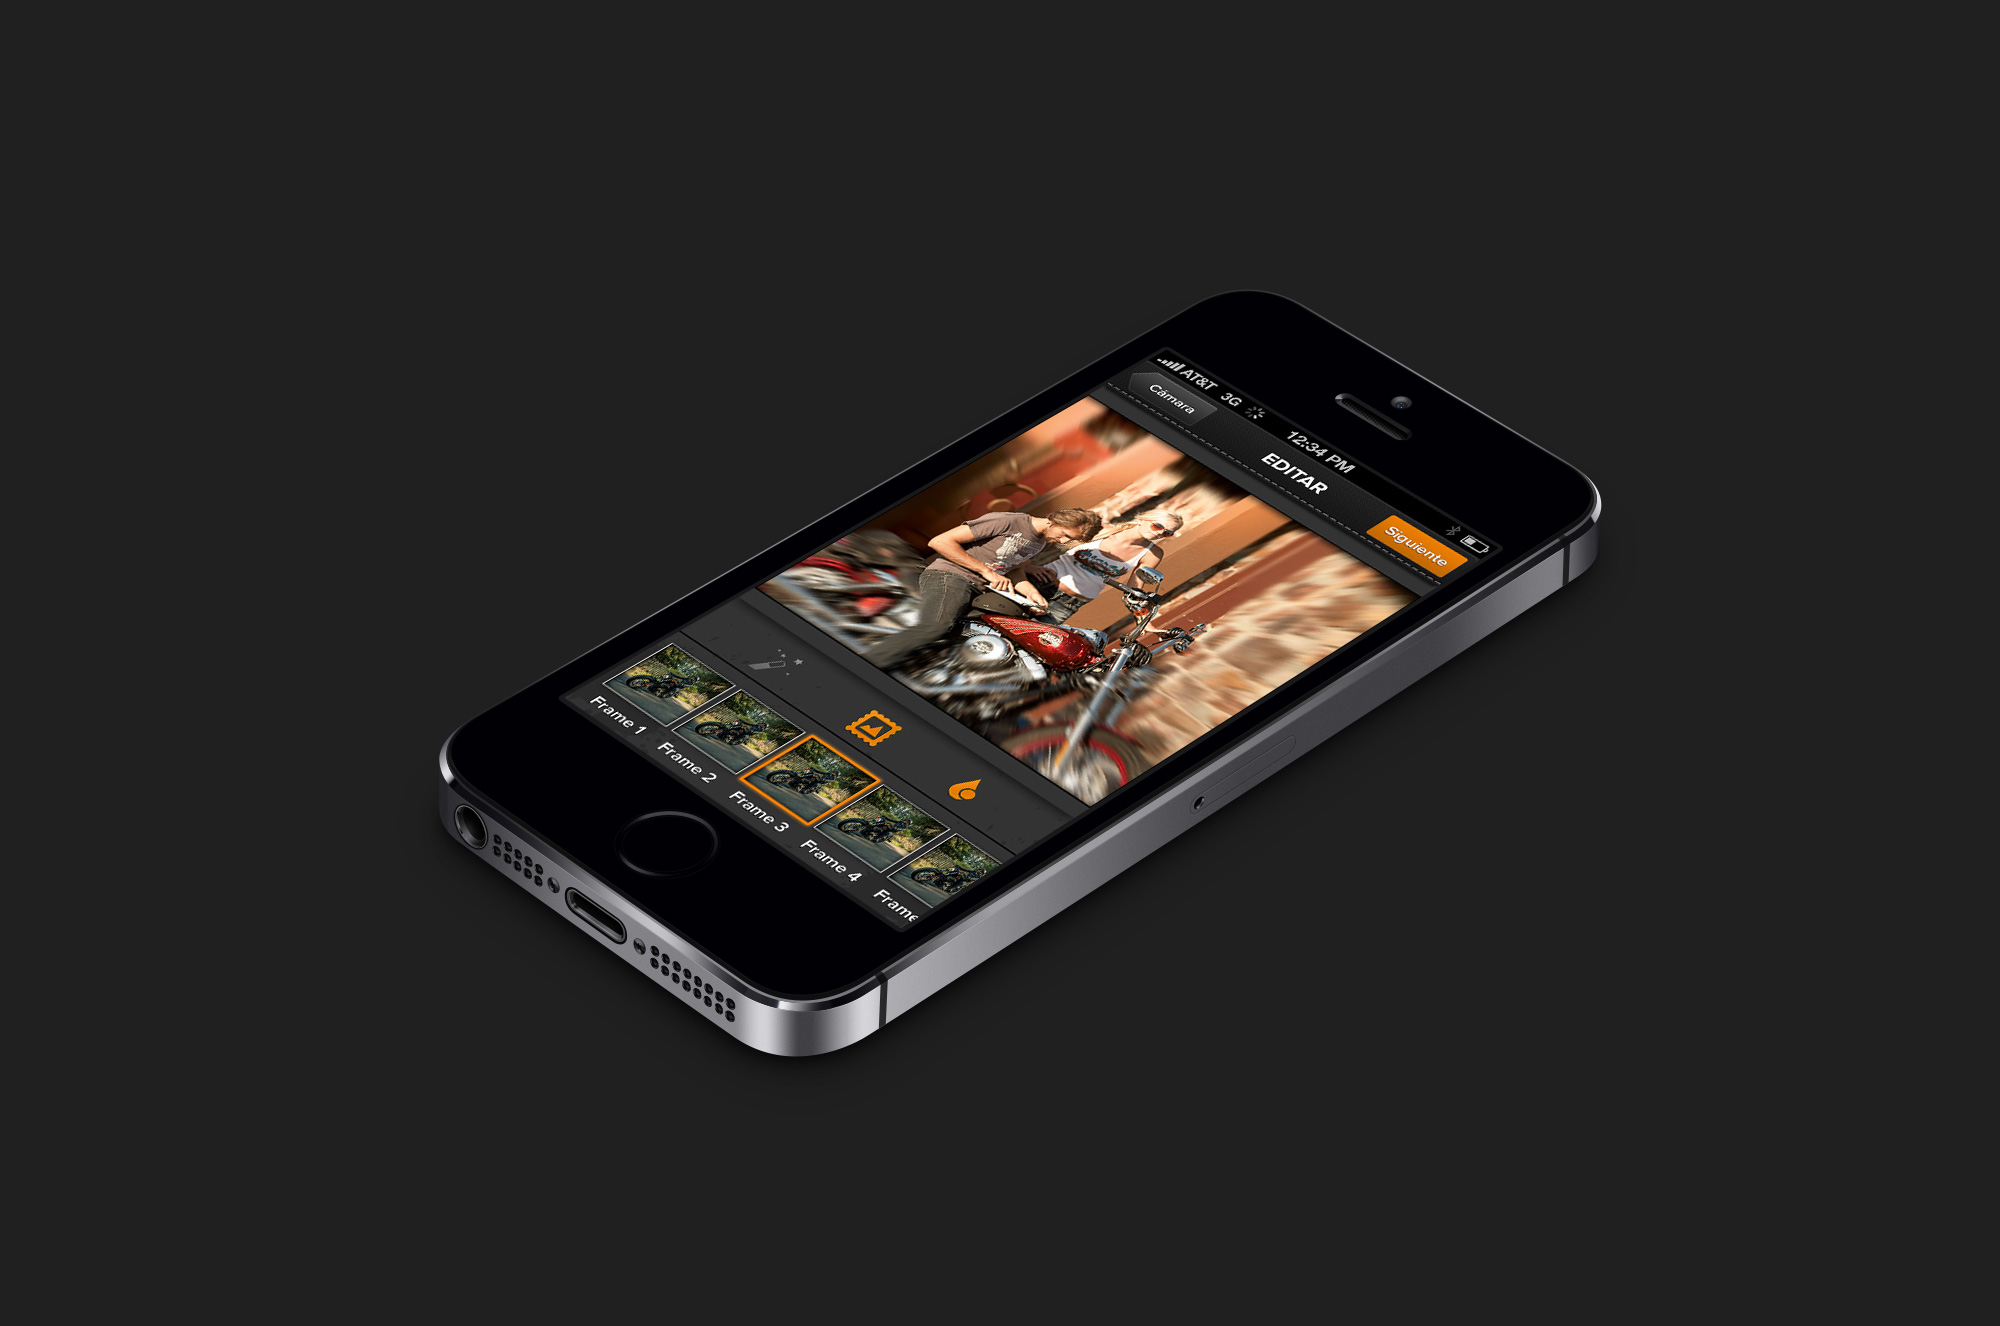 raniev-rod-alvarez-diseño-gráfico-queretaro-app-harley-davidson-harleygram-5